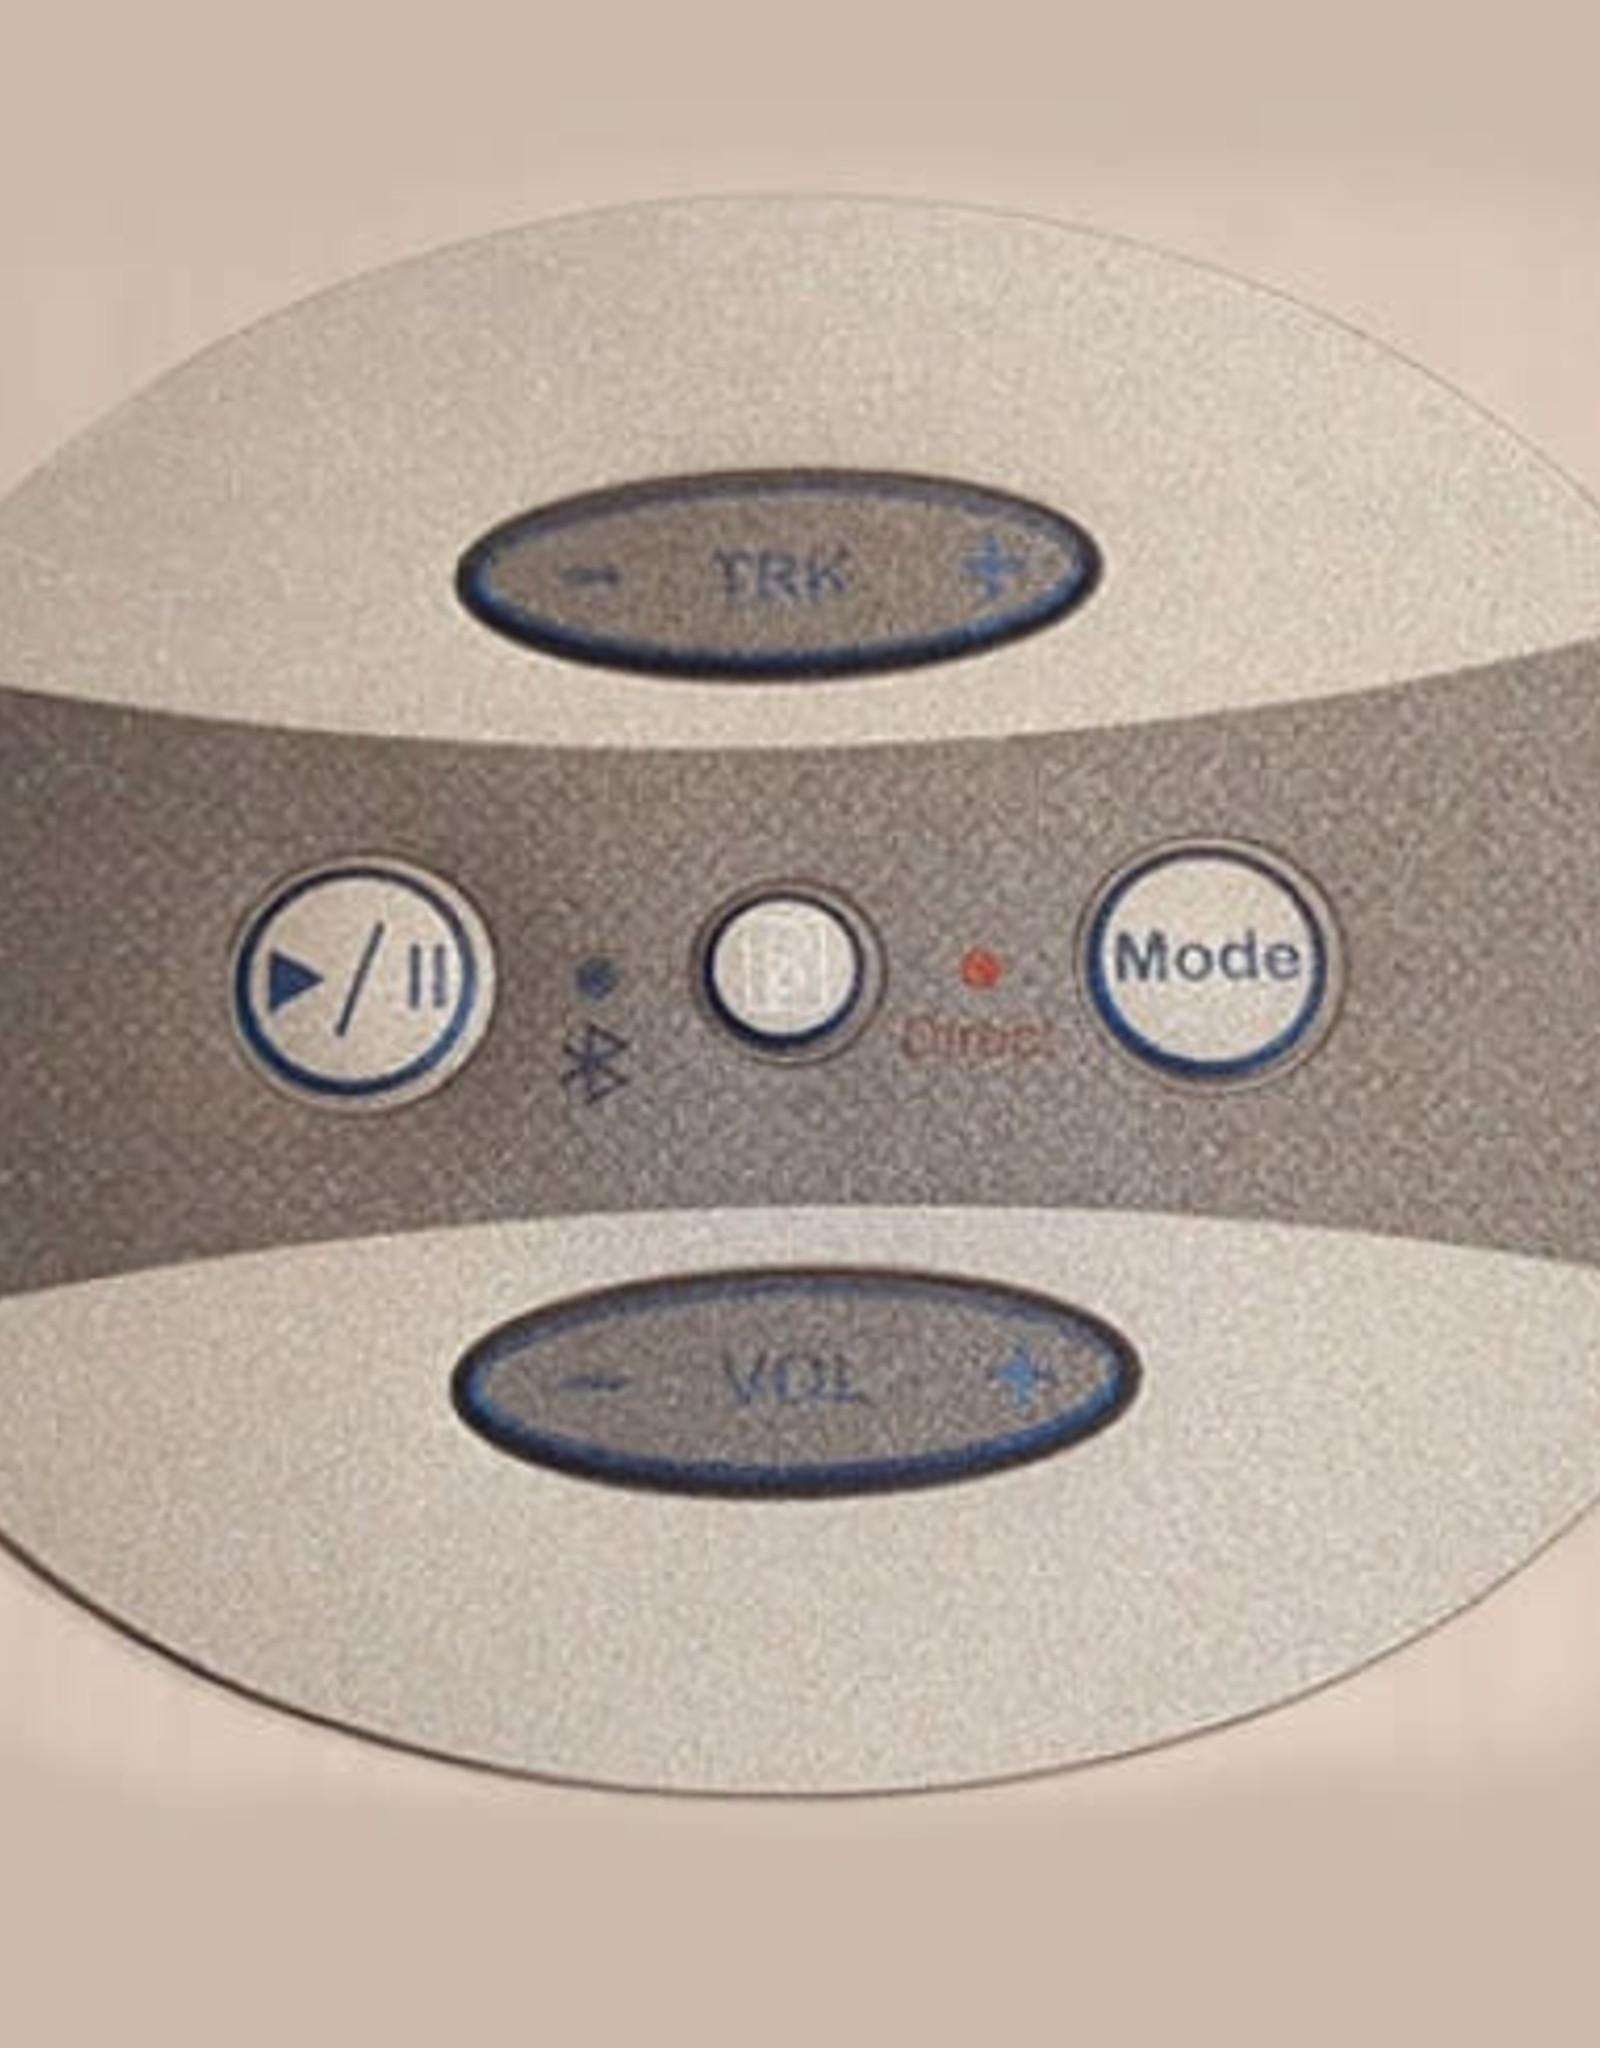 BEACHCOMBER beachcomber stereo sticker overlay